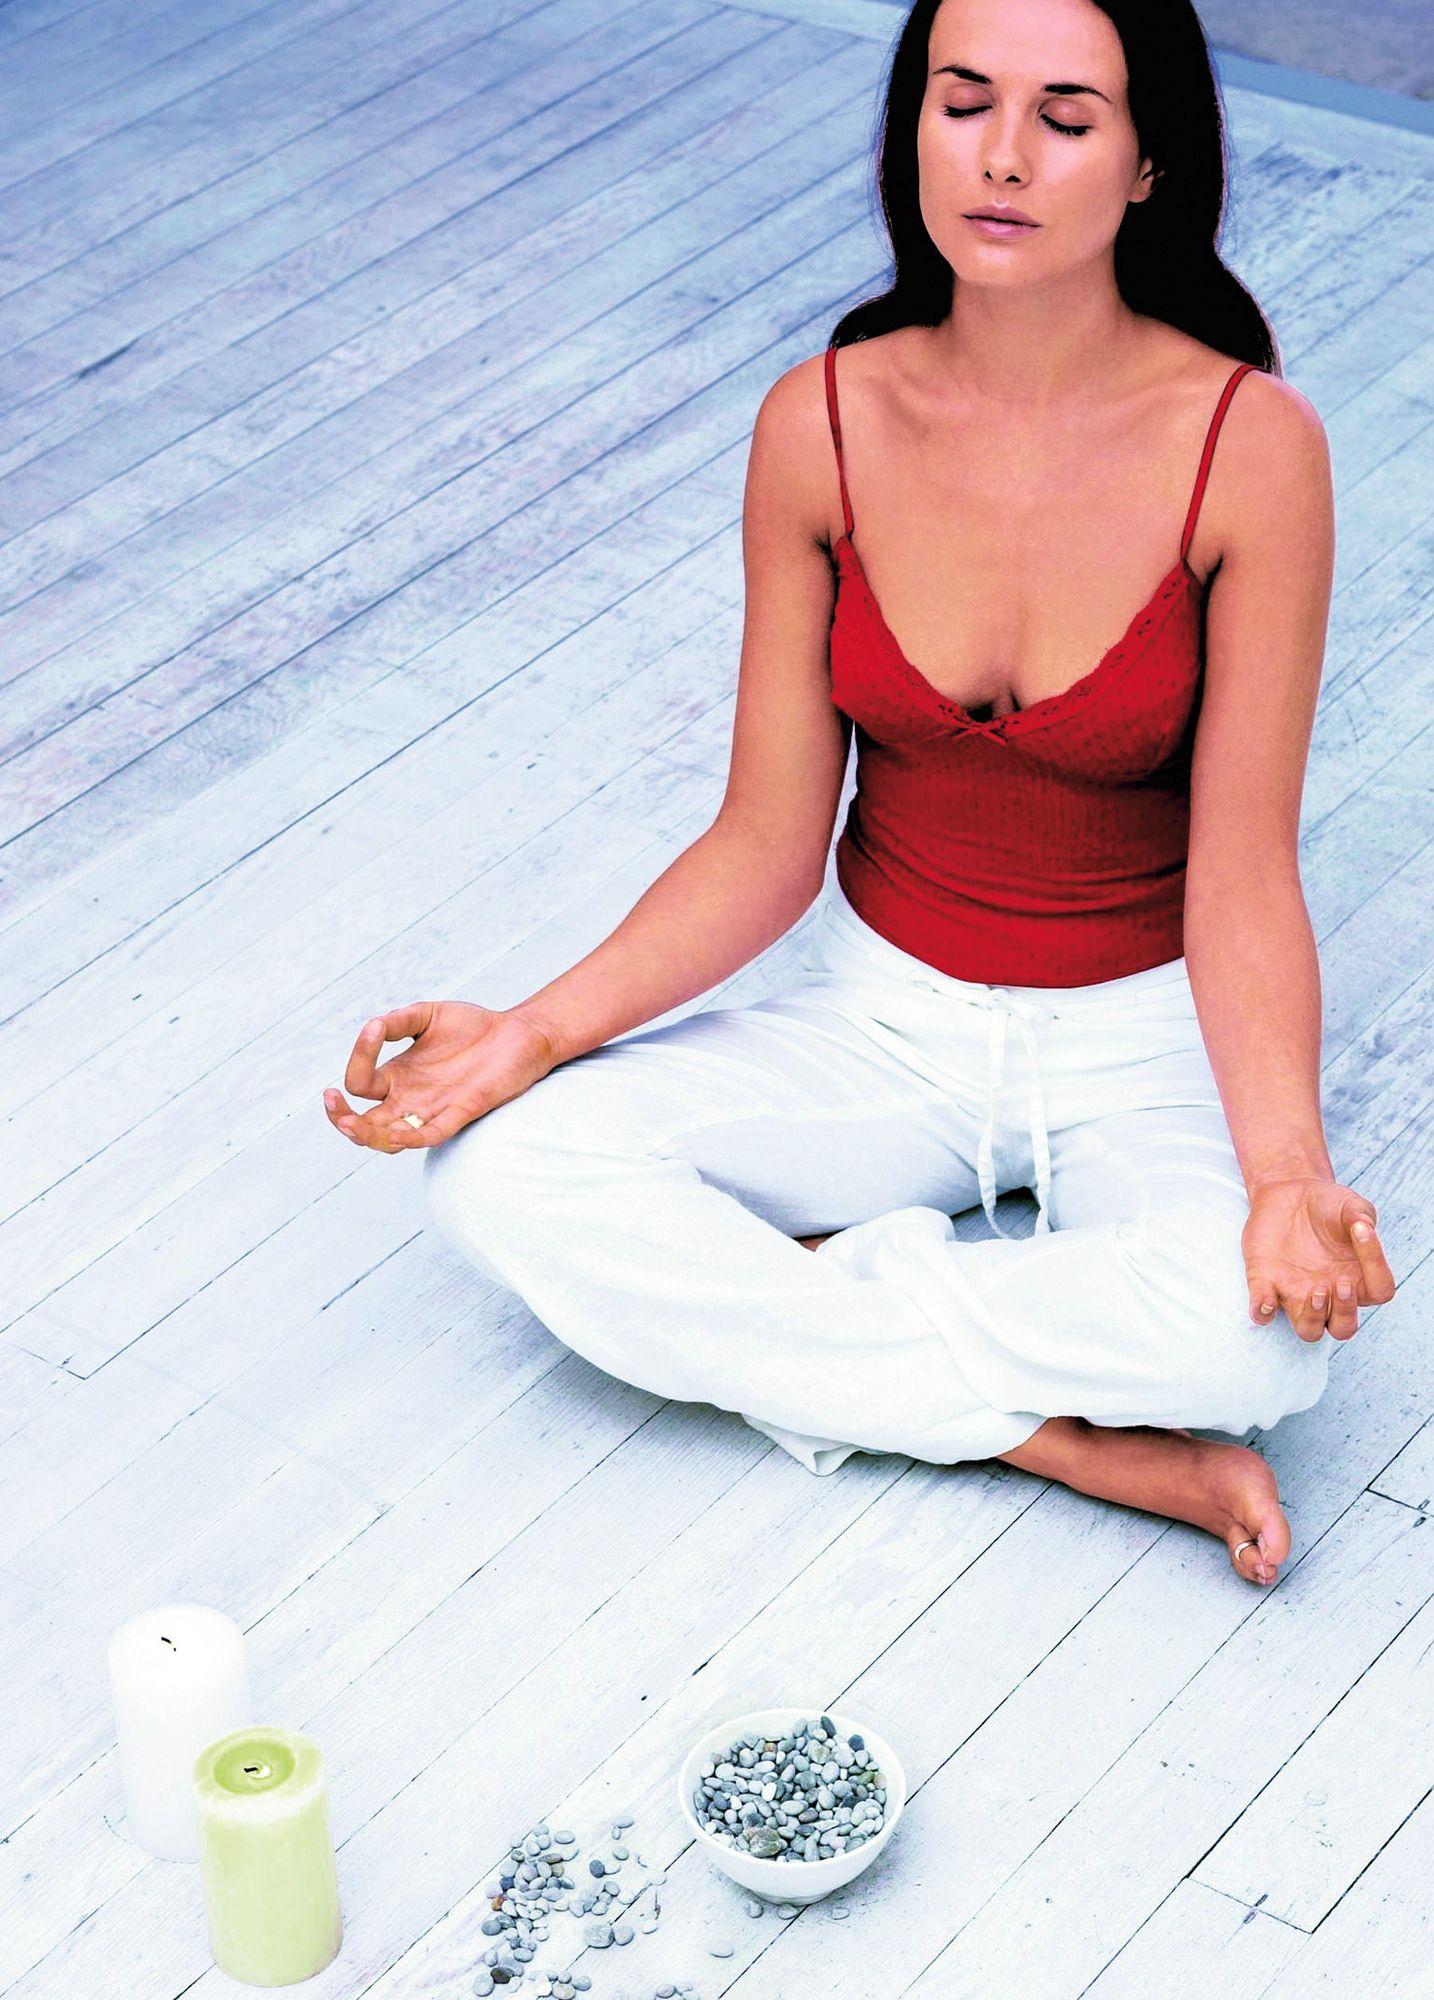 SYMBOLBILD Meditation / Entspannung / Yoga